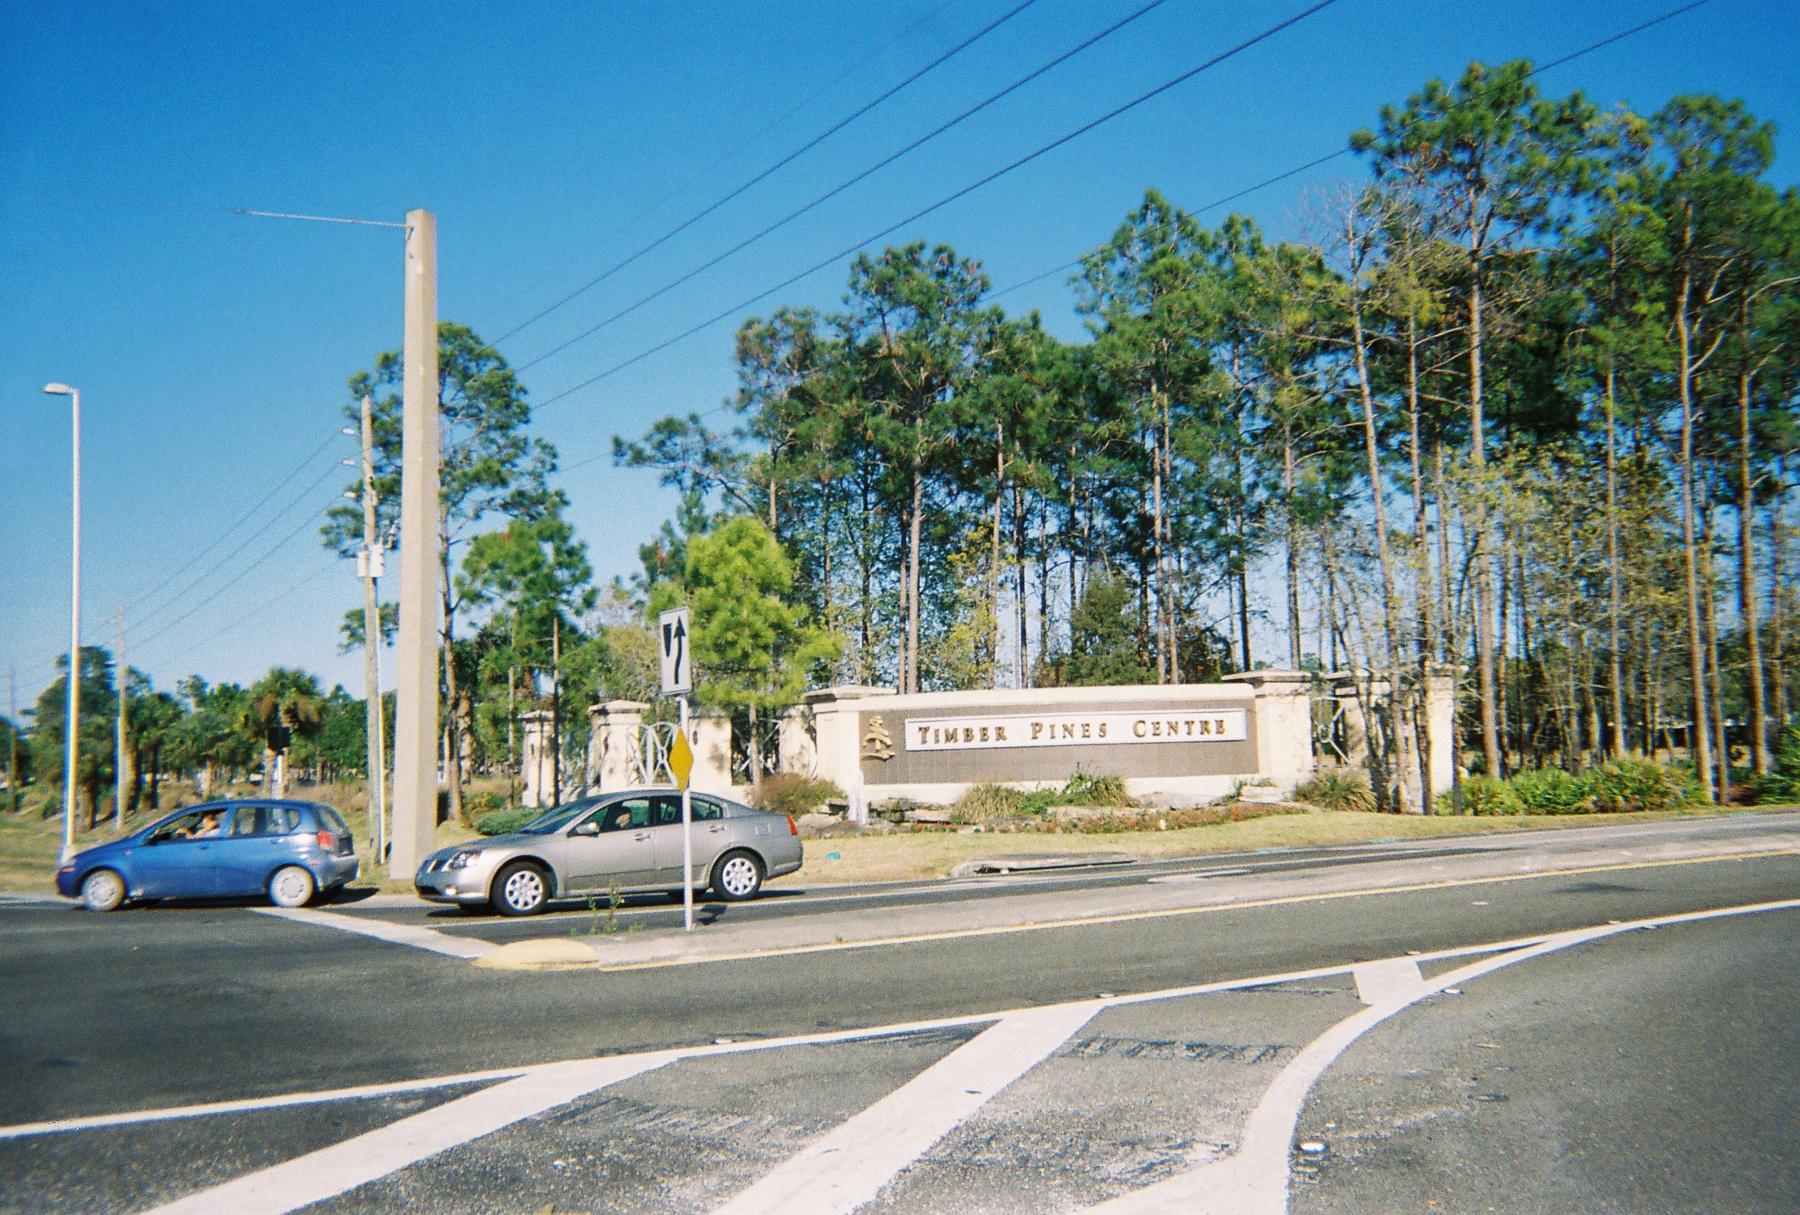 Timber Pines Florida Wikipedia